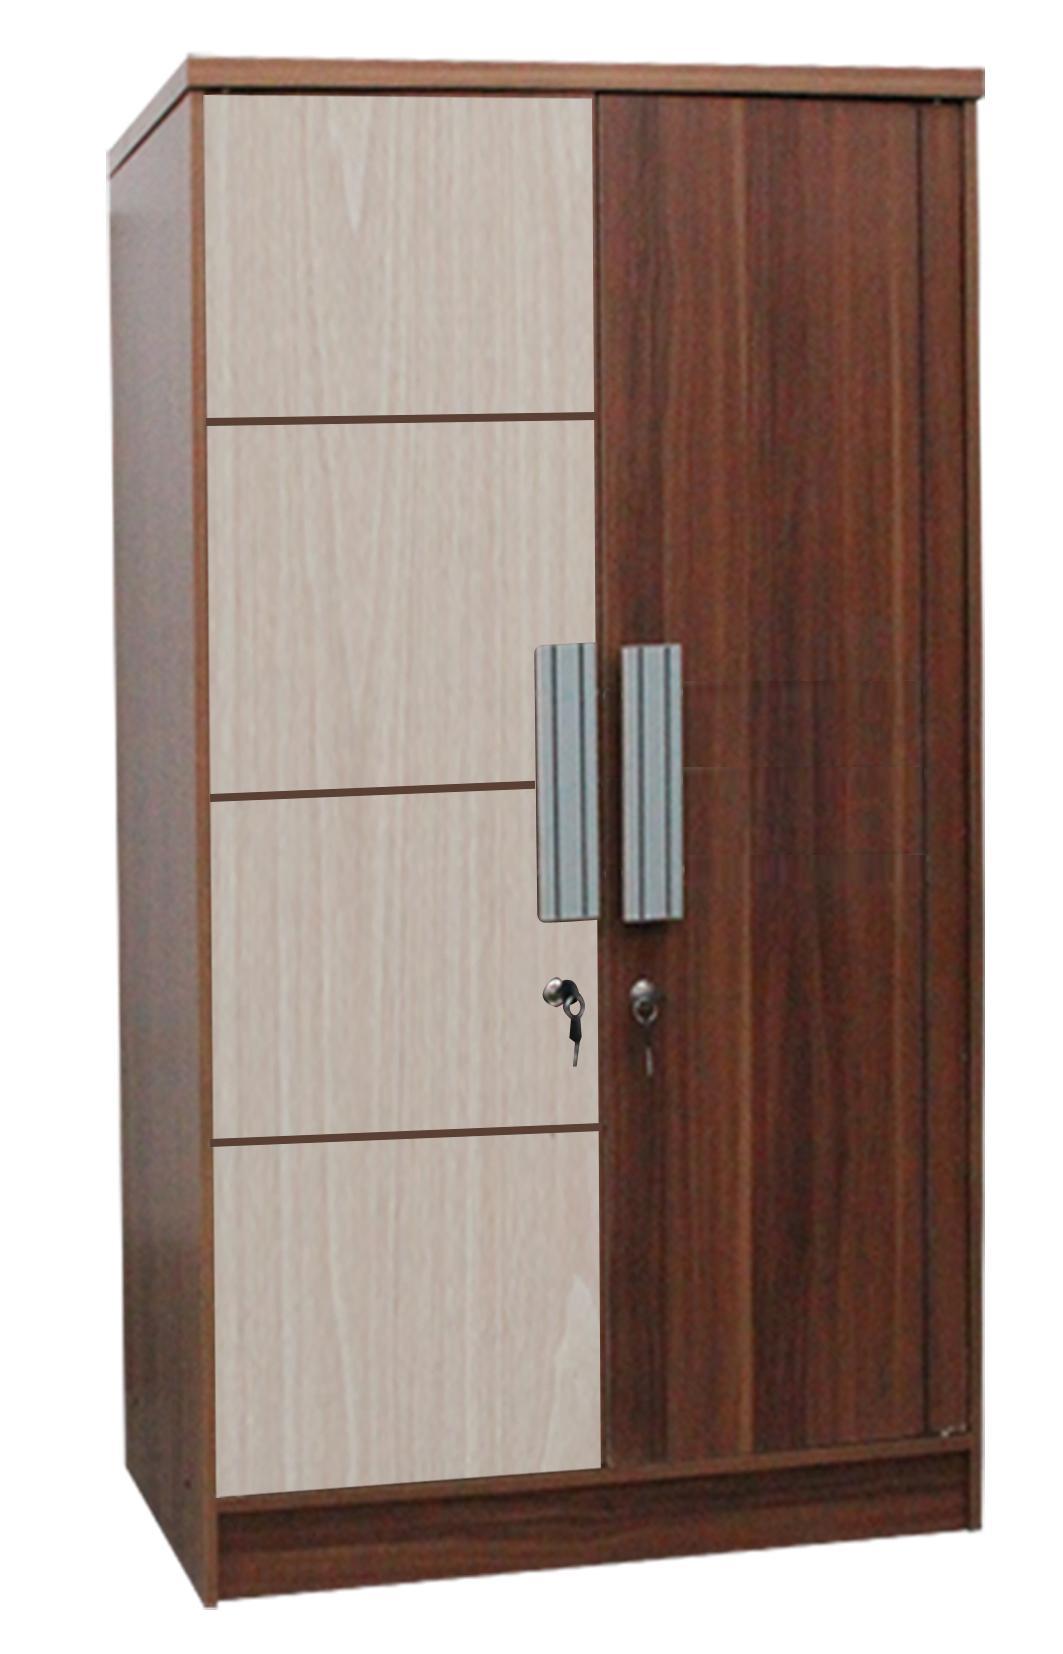 Lemari kayu minimalis Pakaian Anak BL LA - 456